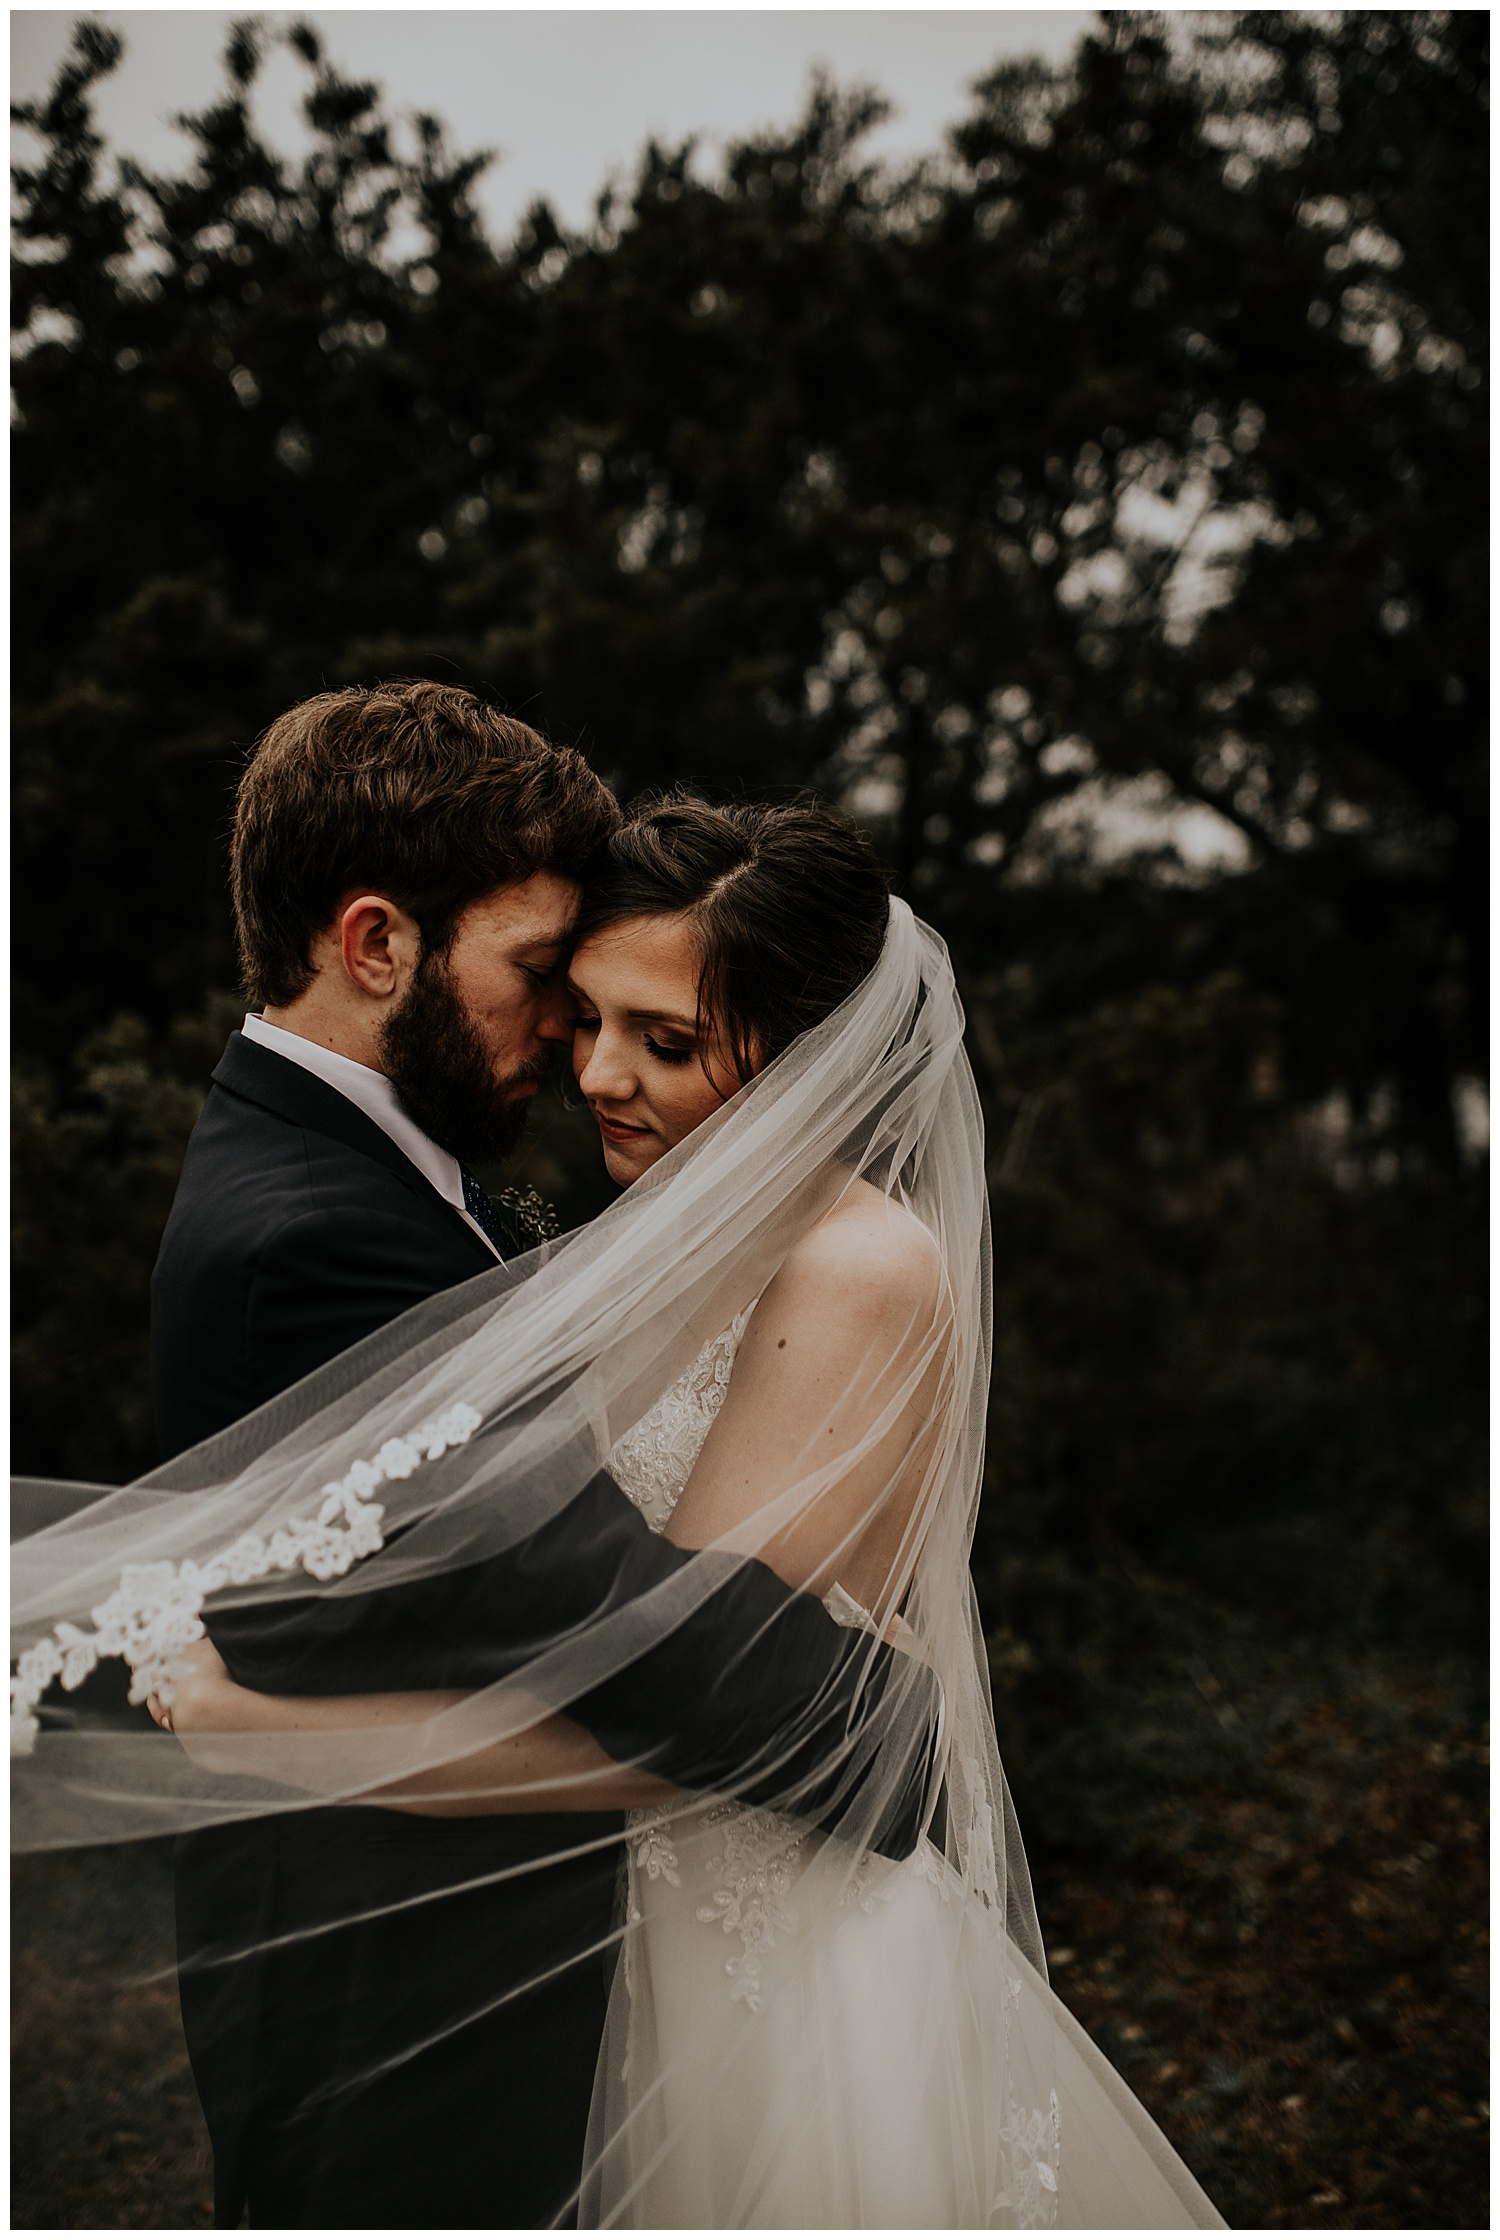 Laken-Mackenzie-Photography-Burge-Wedding-Stillwater-Meadow-Aledo-Texas-Dallas-Fort-Worth-Wedding-Photographer20.jpg